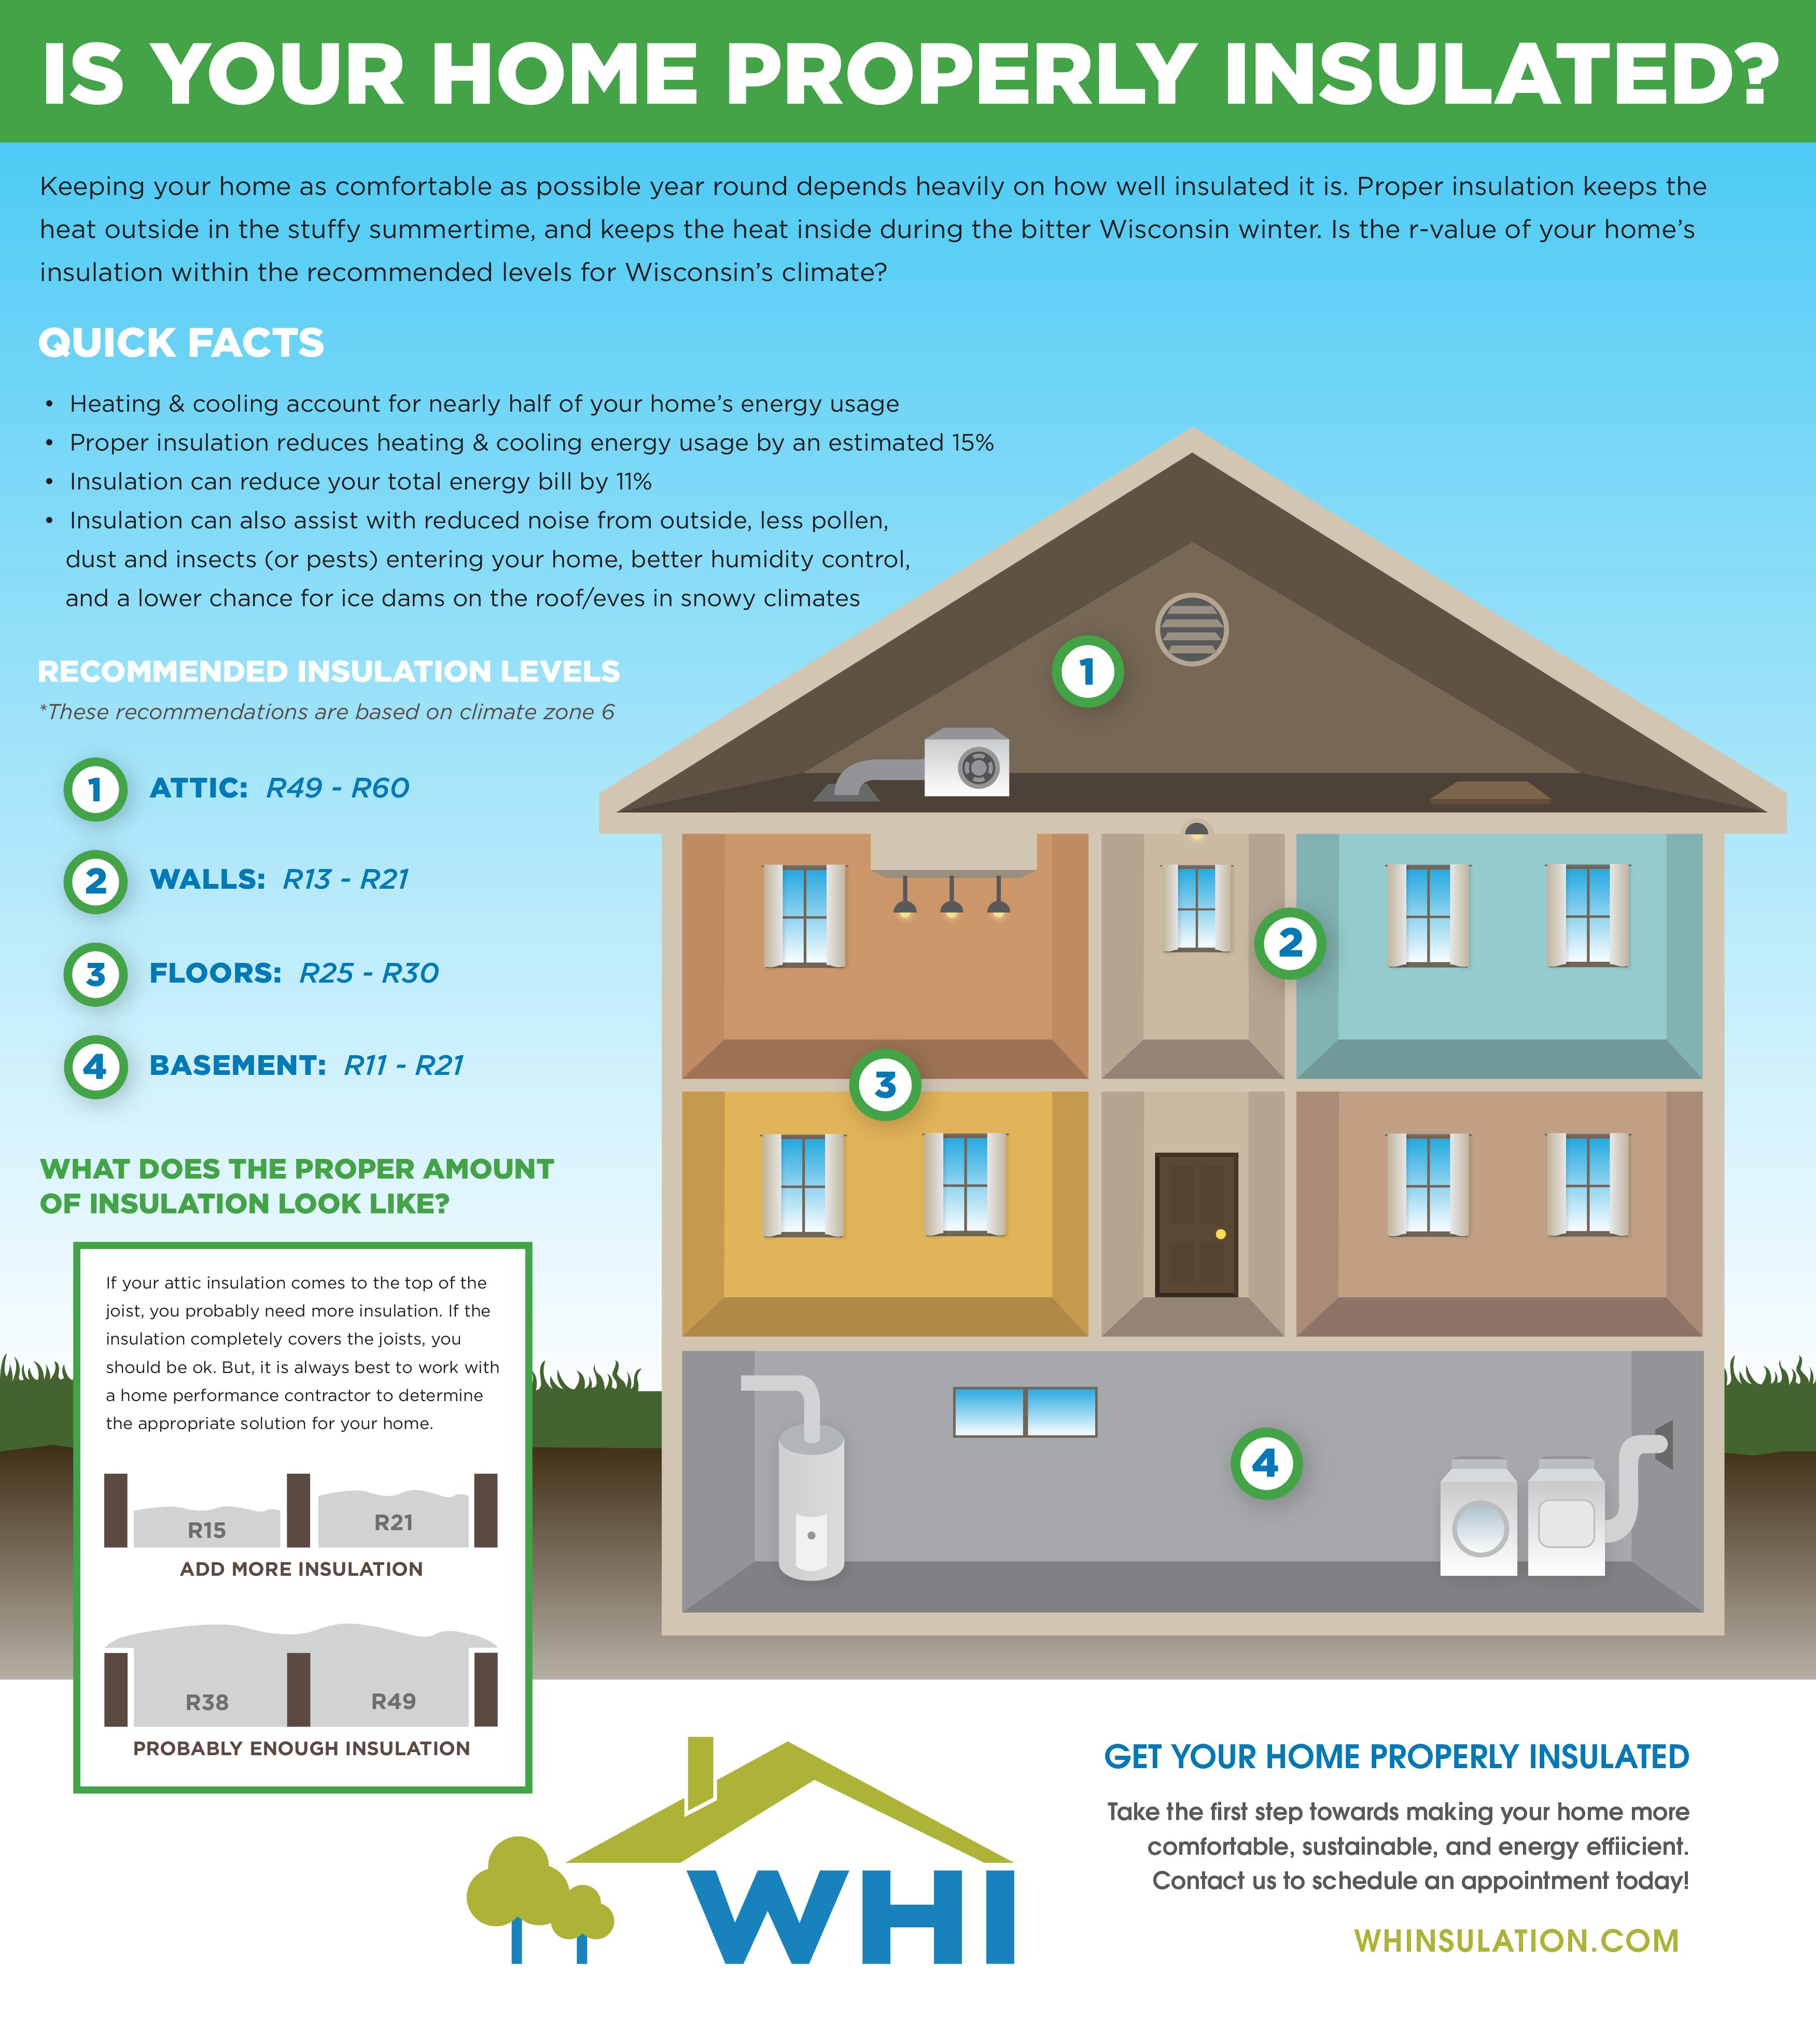 insulation, attic, walls, floors, basement